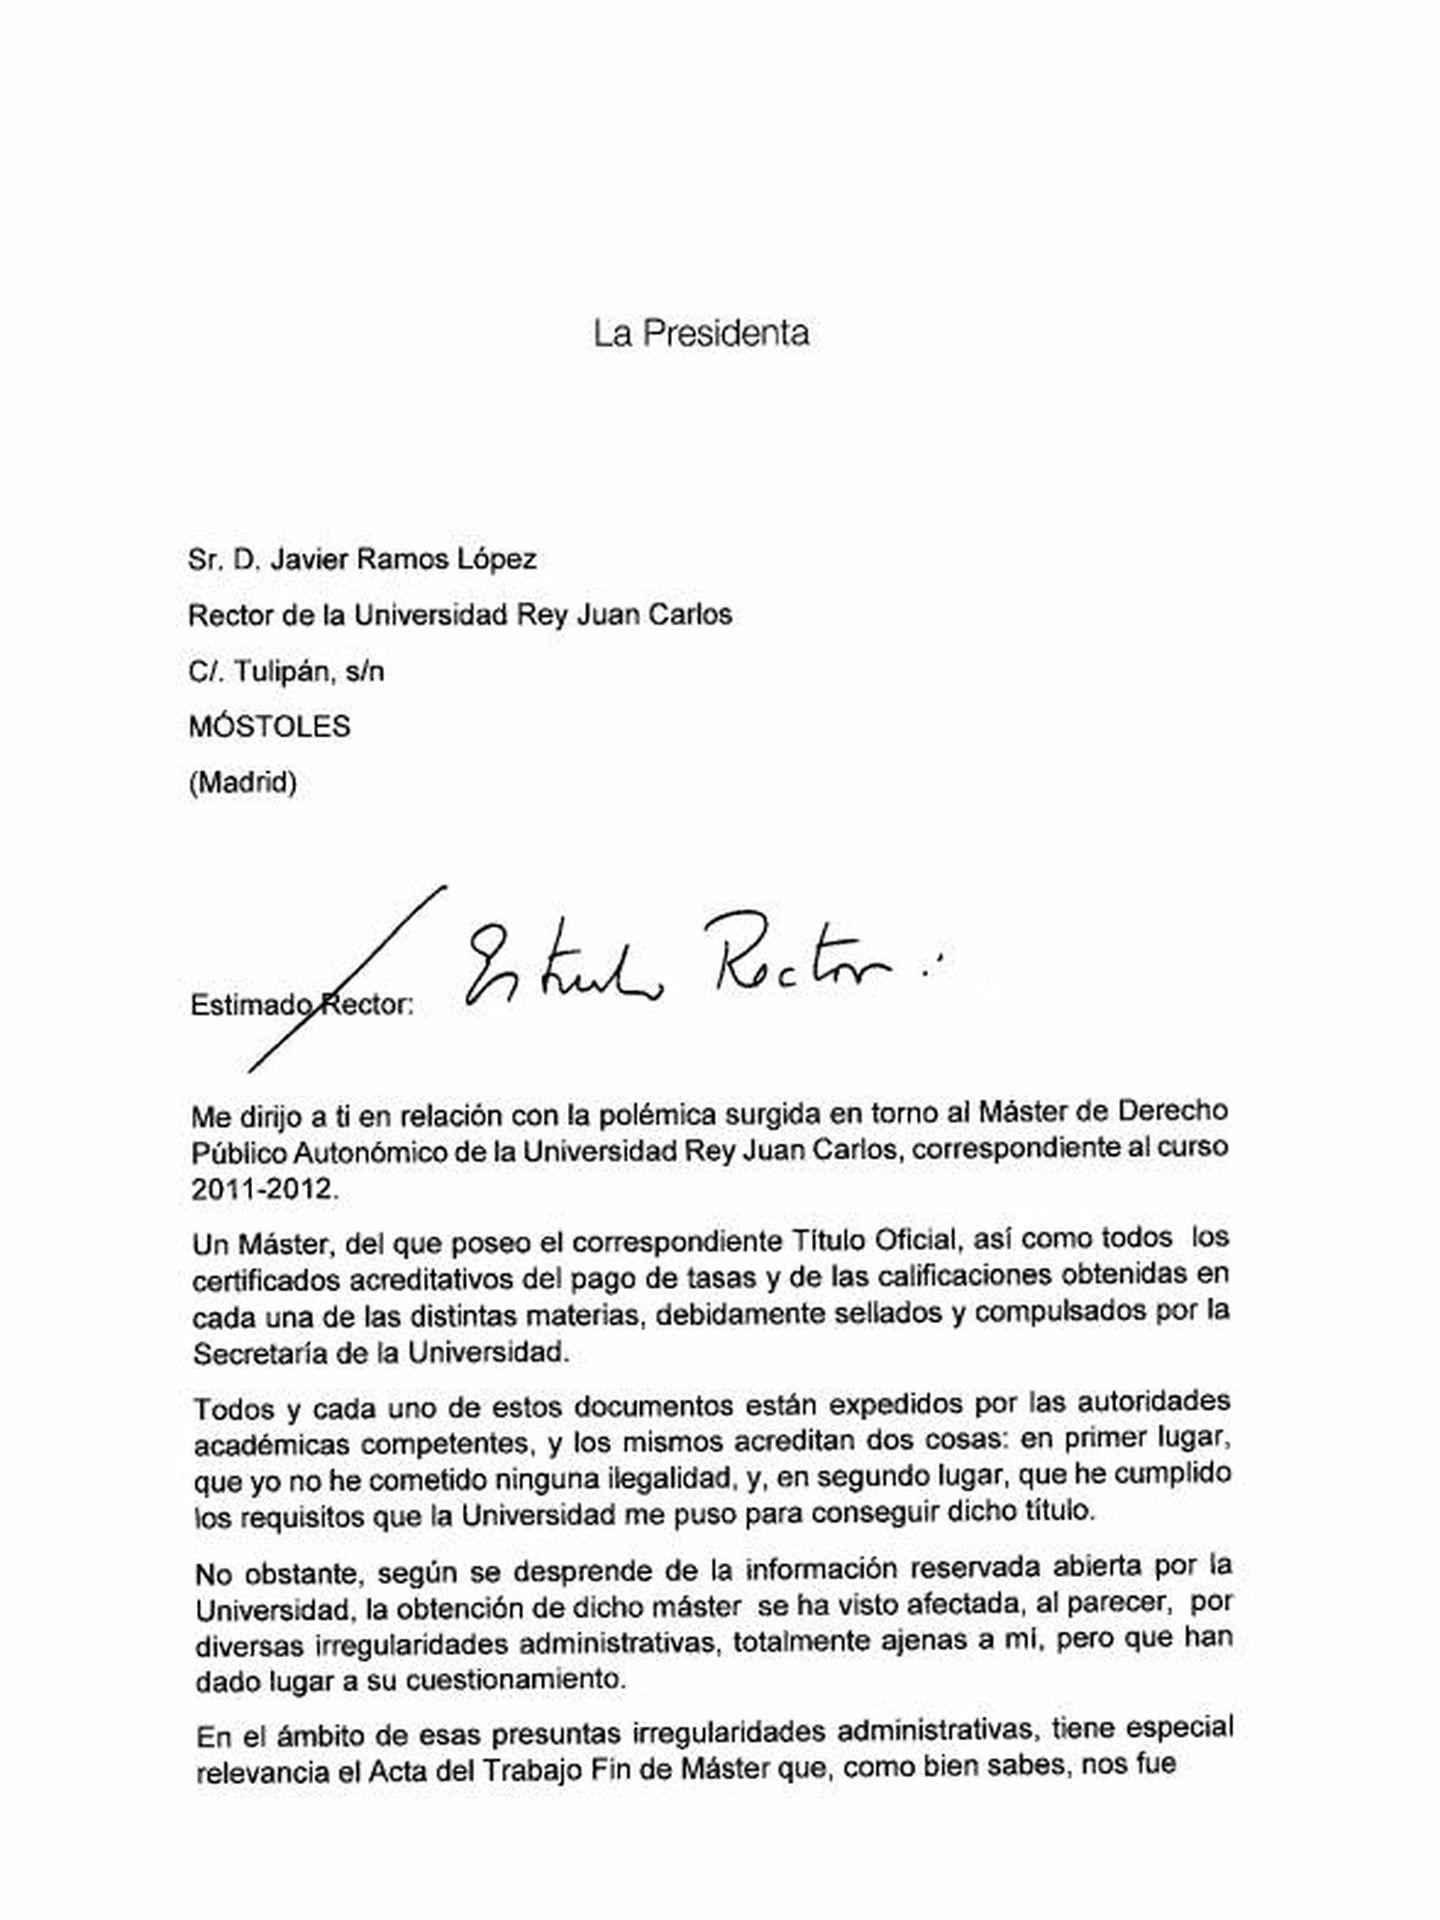 Pulse en la imagen para leer la carta de Cristina Cifuentes